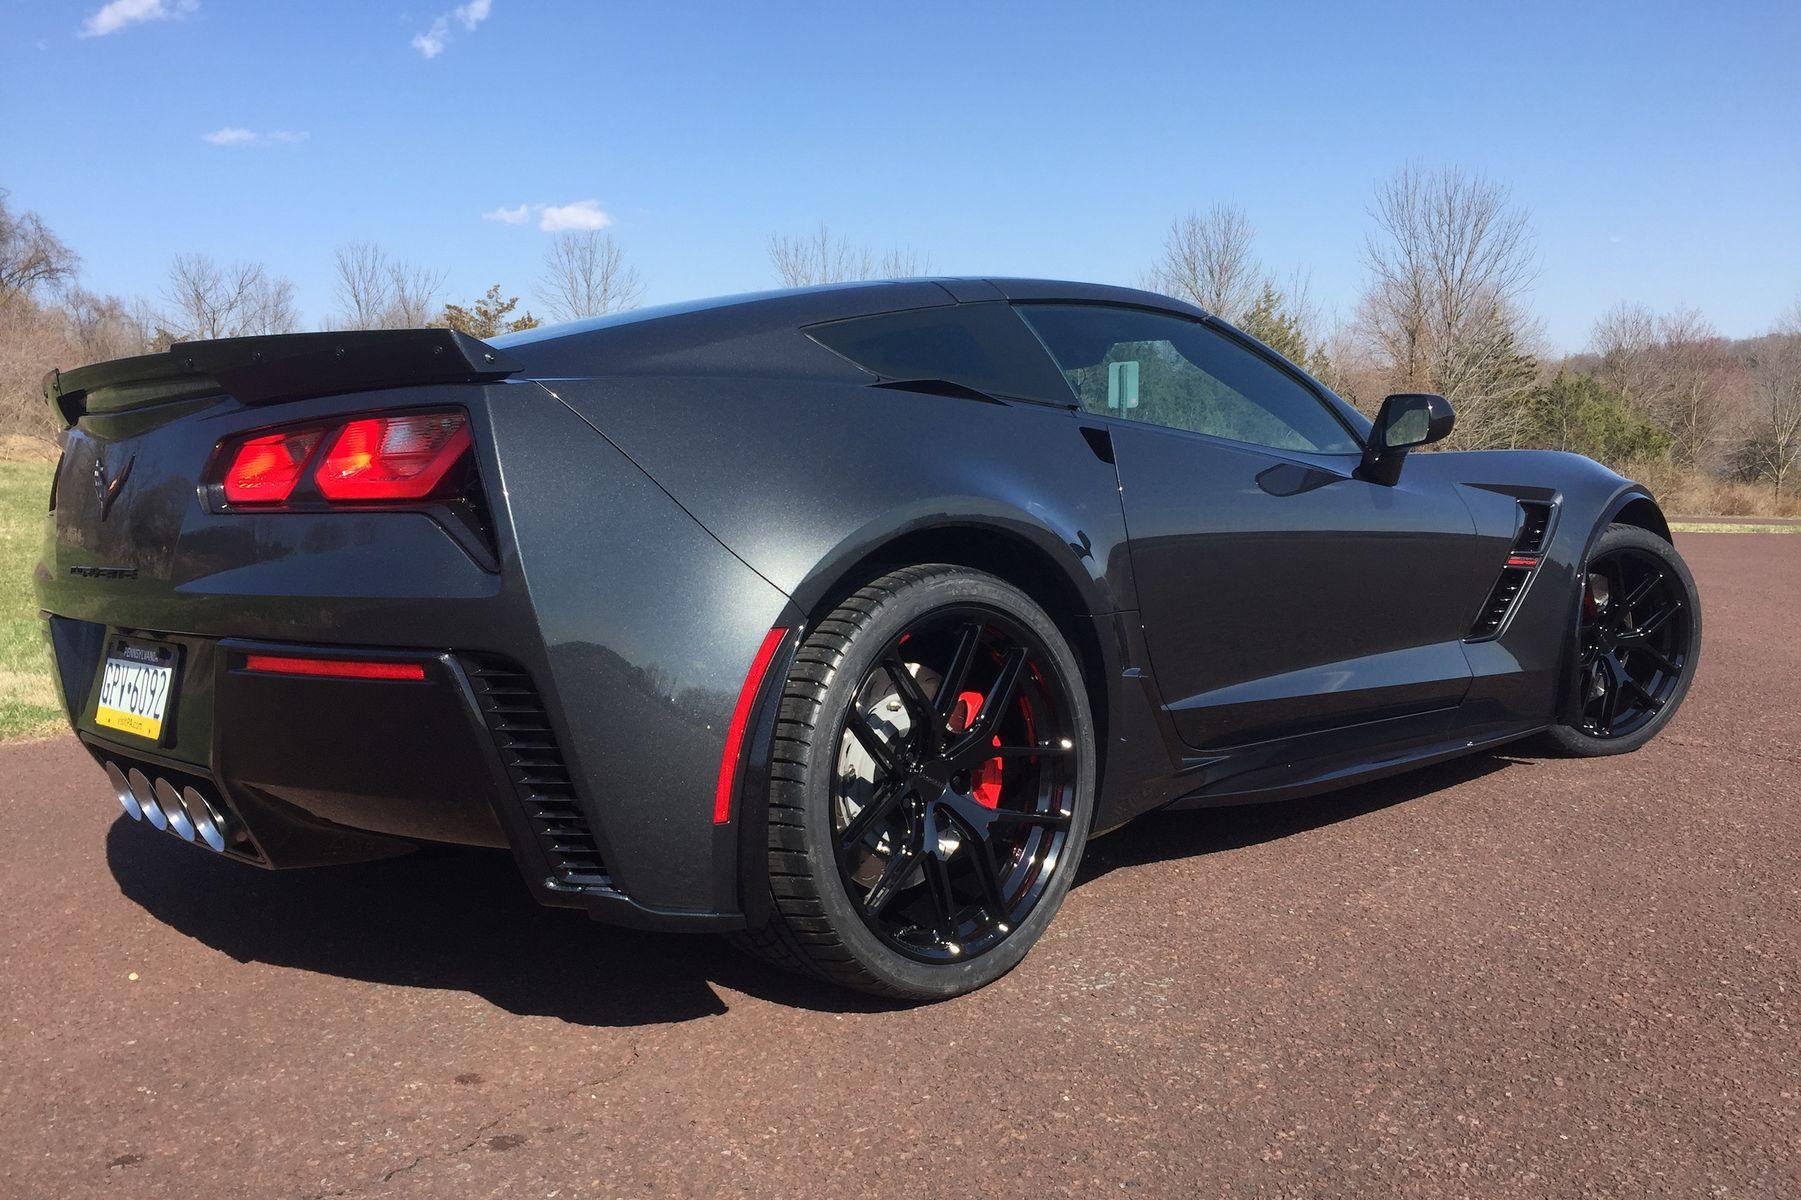 2019 Chevrolet Corvette   Ron Alfor's C7 Corvette Grand Sport on Forgeline One Piece Forged Monoblock VX1R Wheels